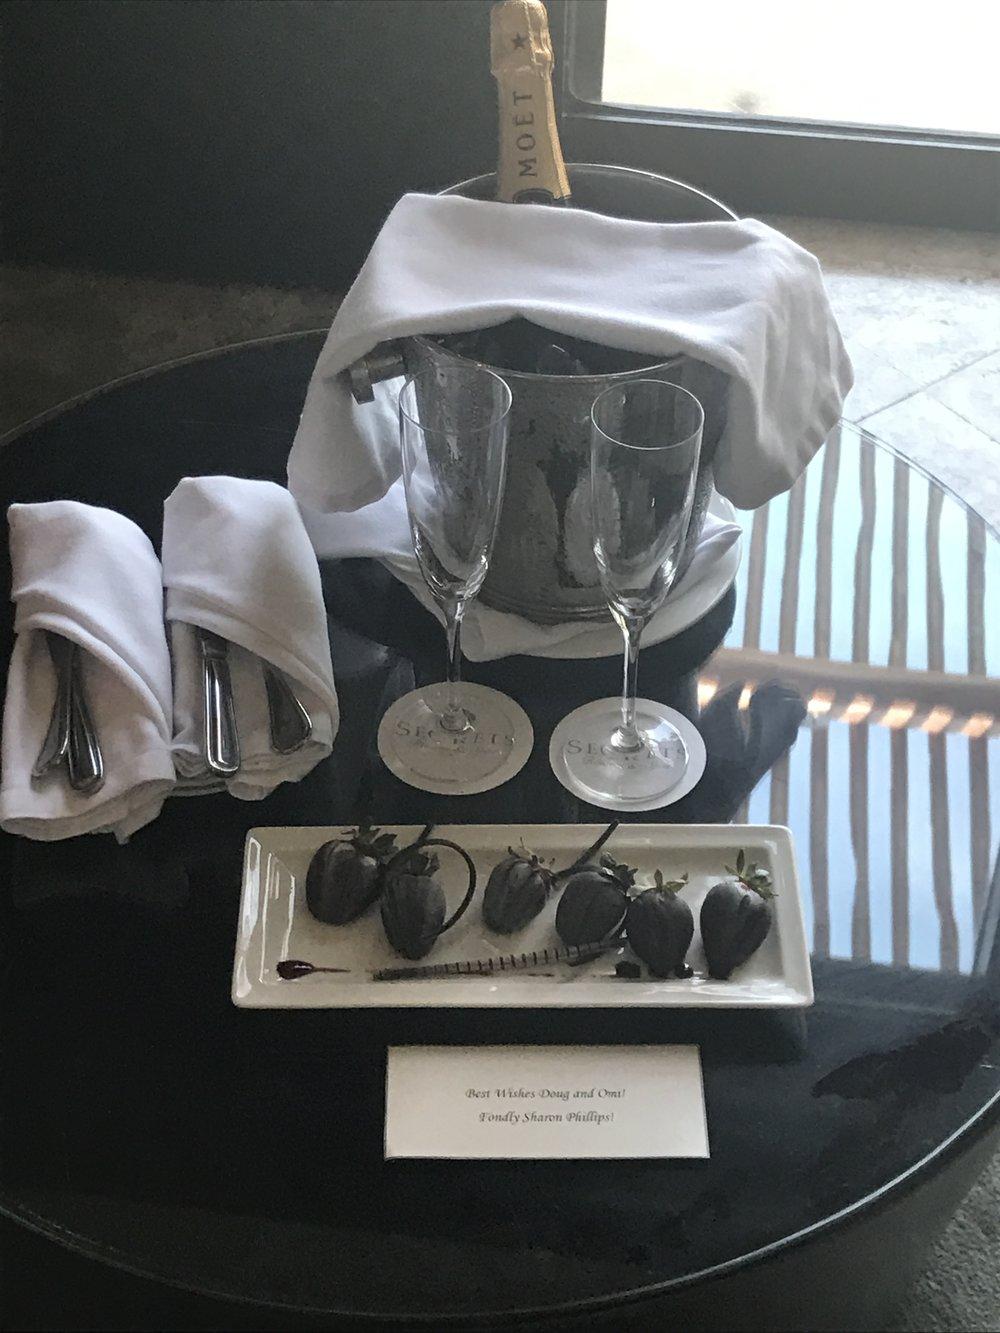 Black Destination Bride - BlackDesti Wedding Countdown Journal - Bridefriends Podcast -4 - Desti  Trip to Cancun Playa del Carmen Delta Mexico15=6 - Secrets Maroma Welcome.JPG